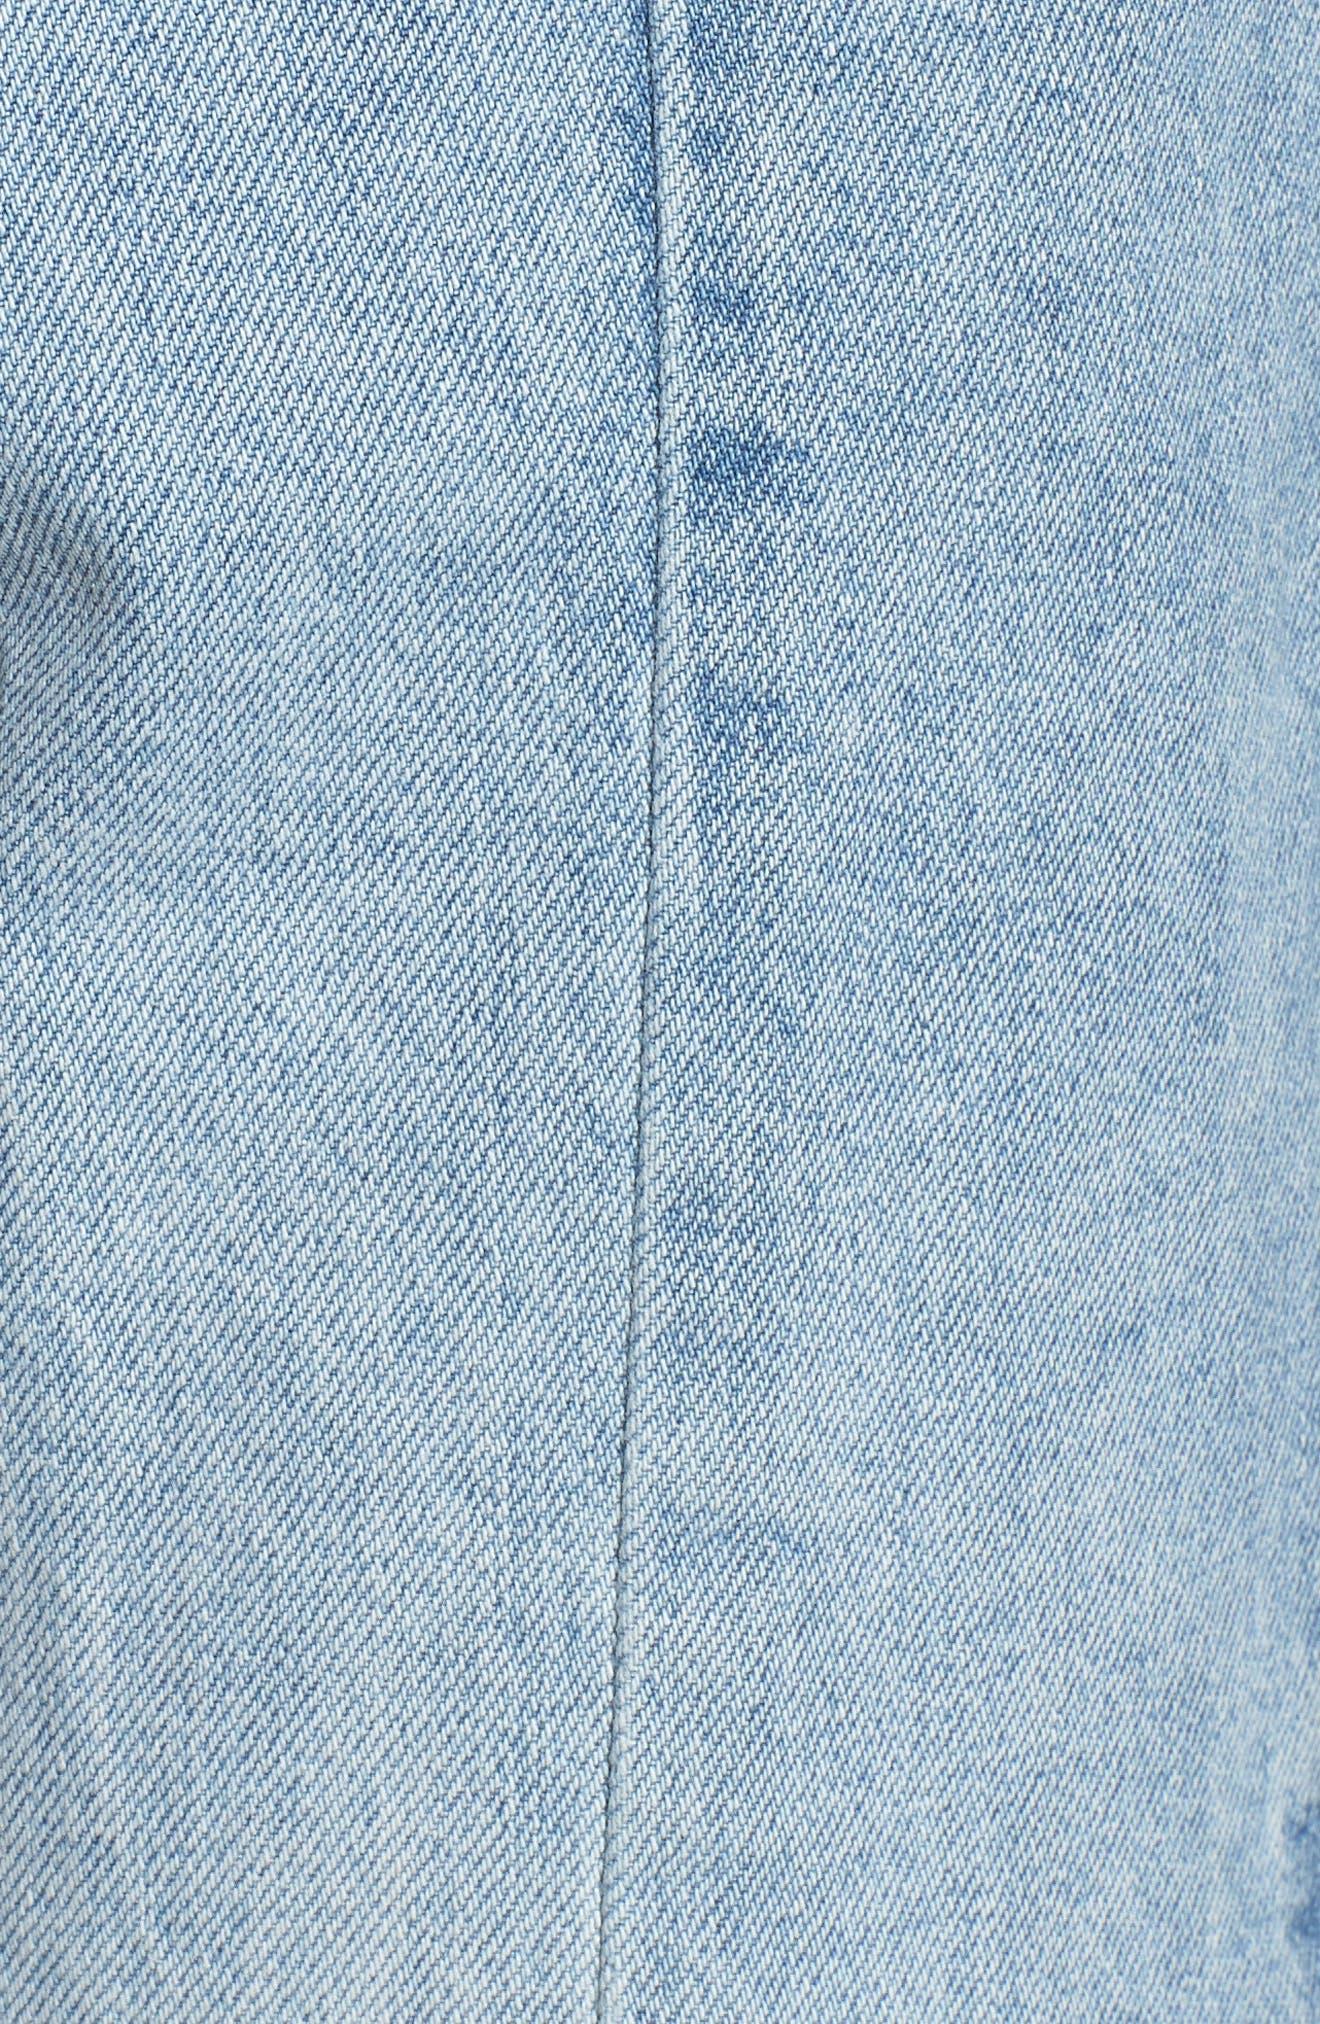 Hepburn High Waist Wide Leg Jeans,                             Alternate thumbnail 7, color,                             Oldtown